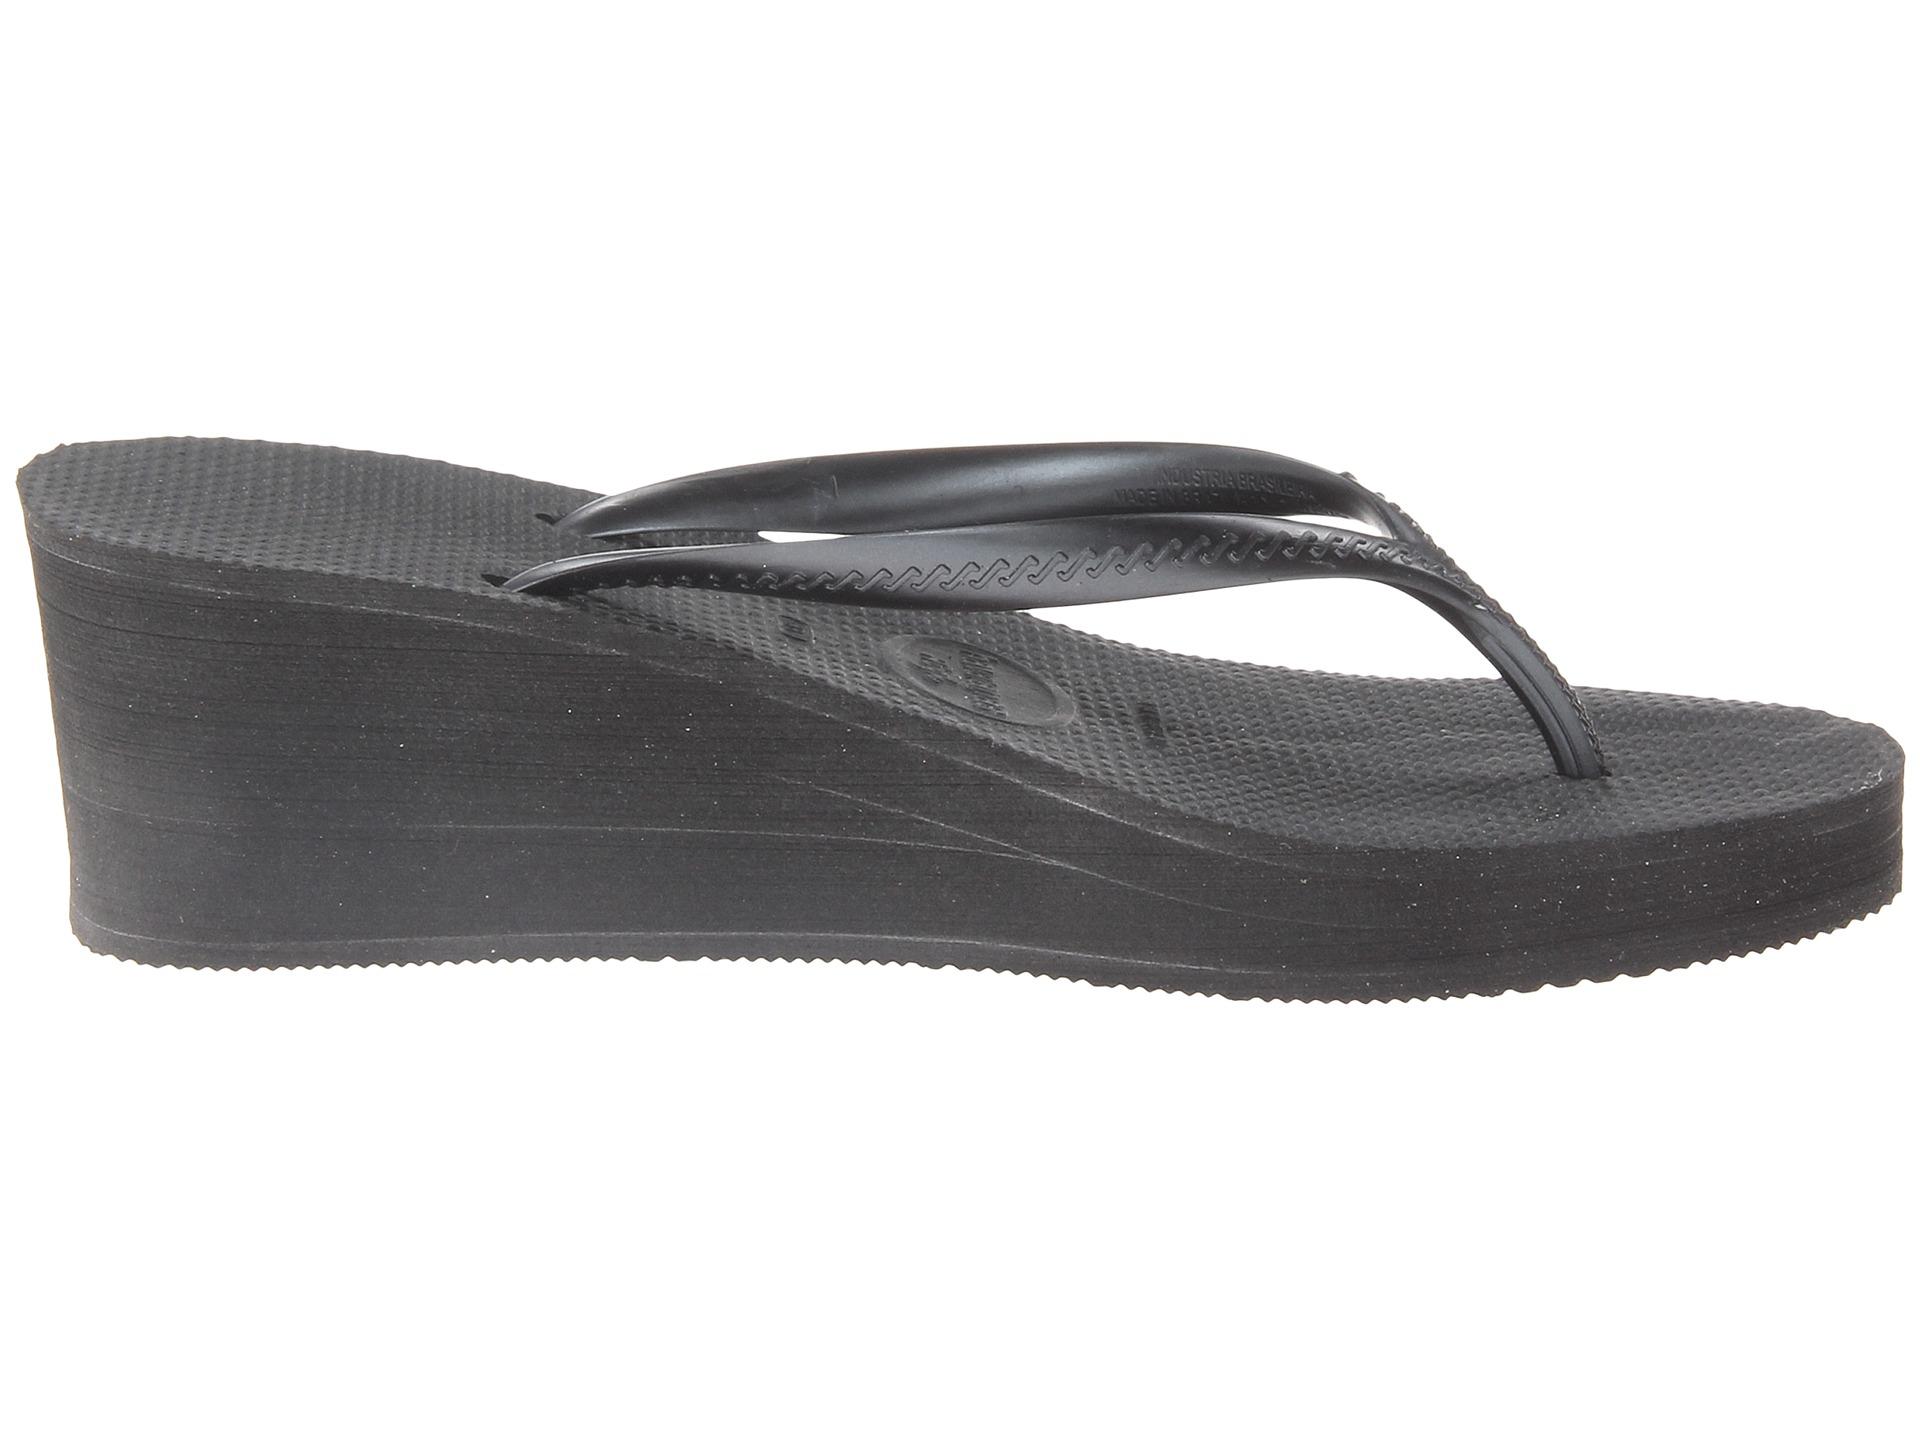 Havaianas High Fashion Flip Flops In Black  Lyst-9622